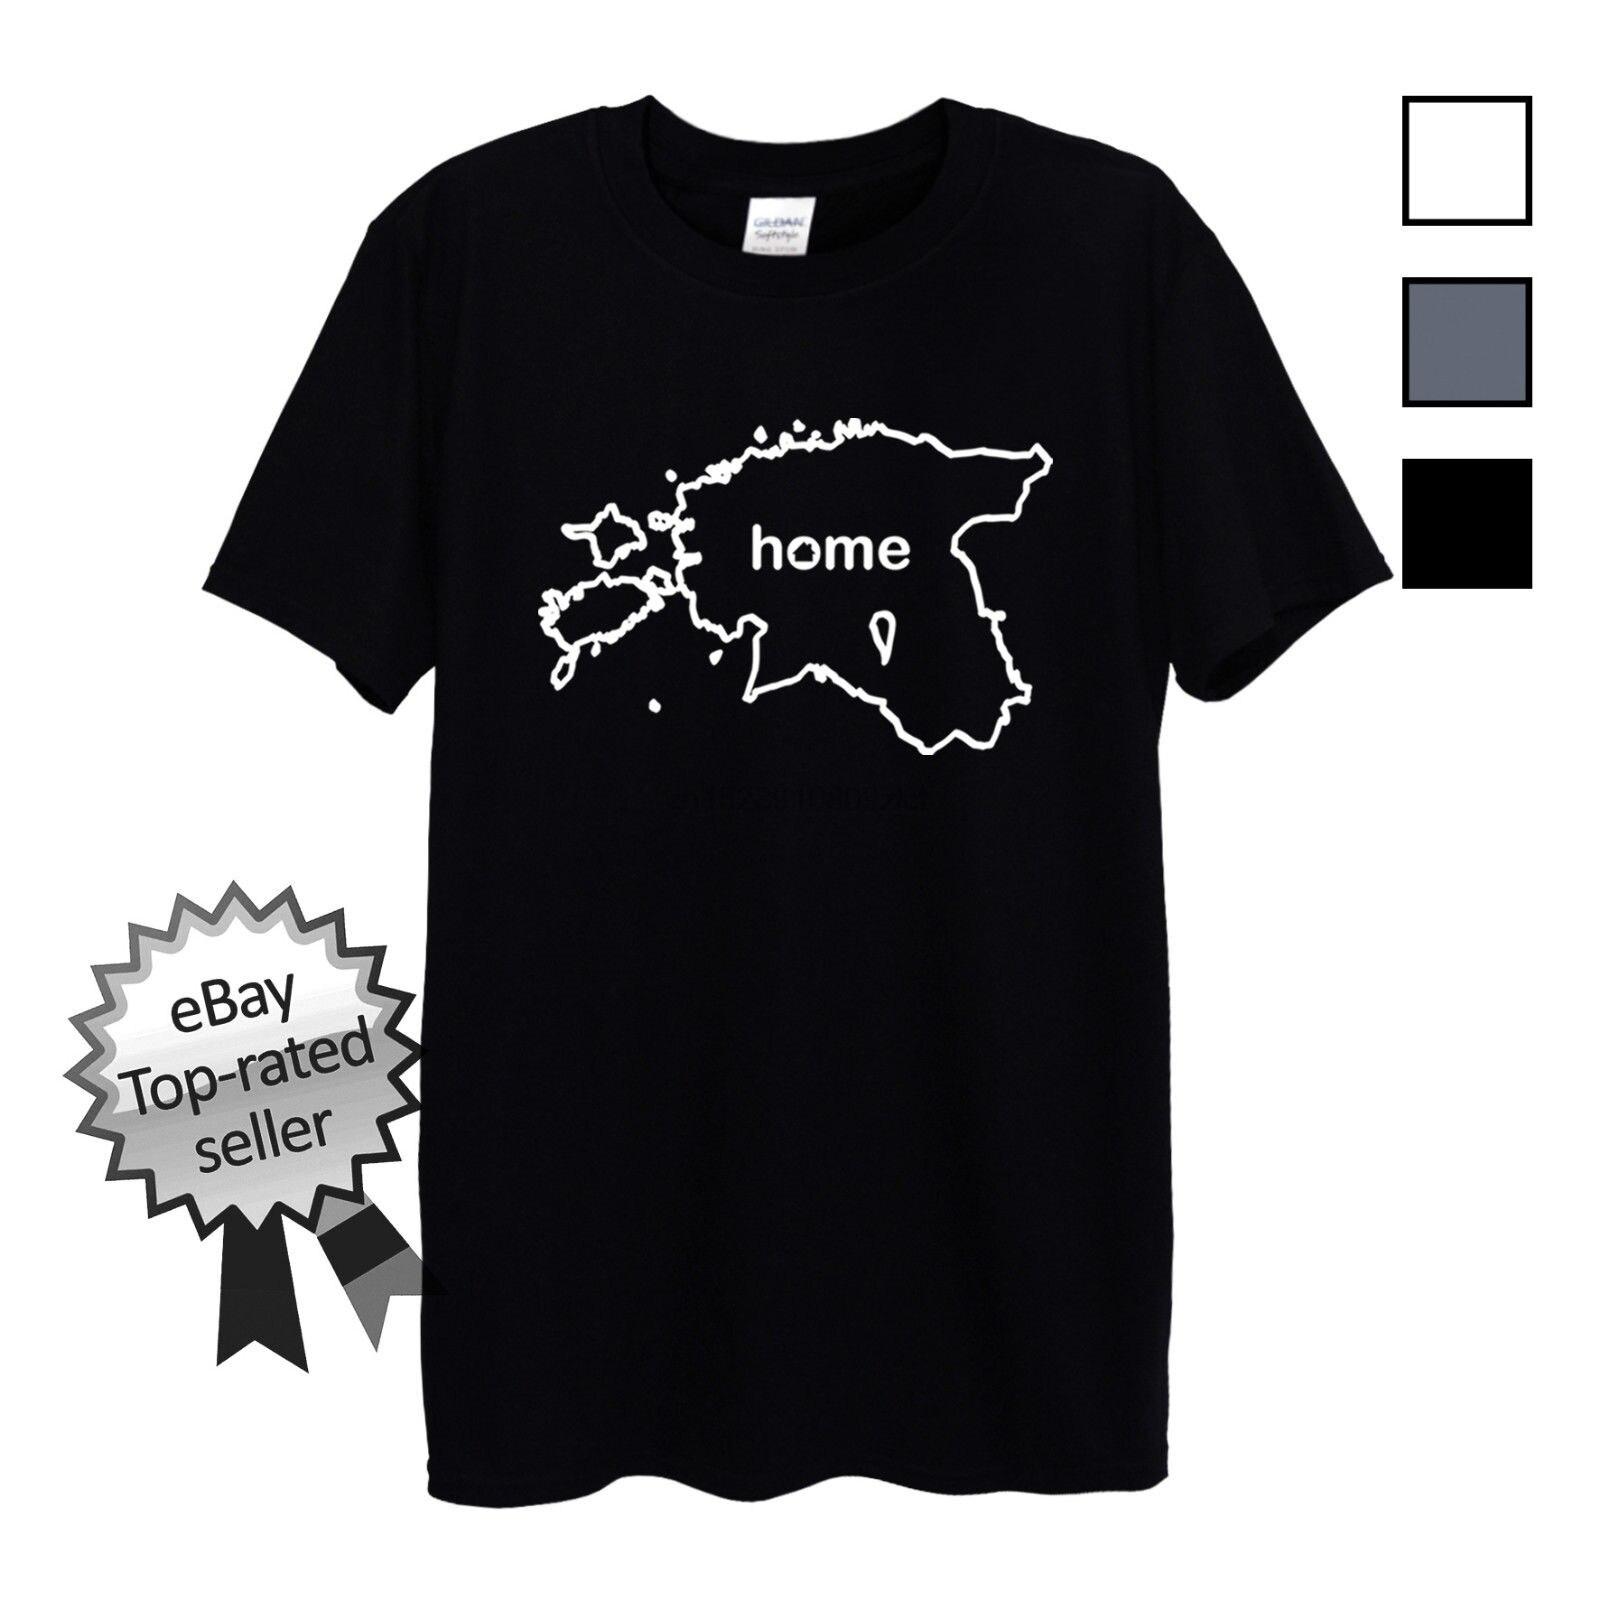 Simple Short-Sleeved Cotton T-Shirt ESTONIA HOME T-Shirt FIND YOUR OWN Country Men OR Women Tallinn Eesti Estonian O-Neck